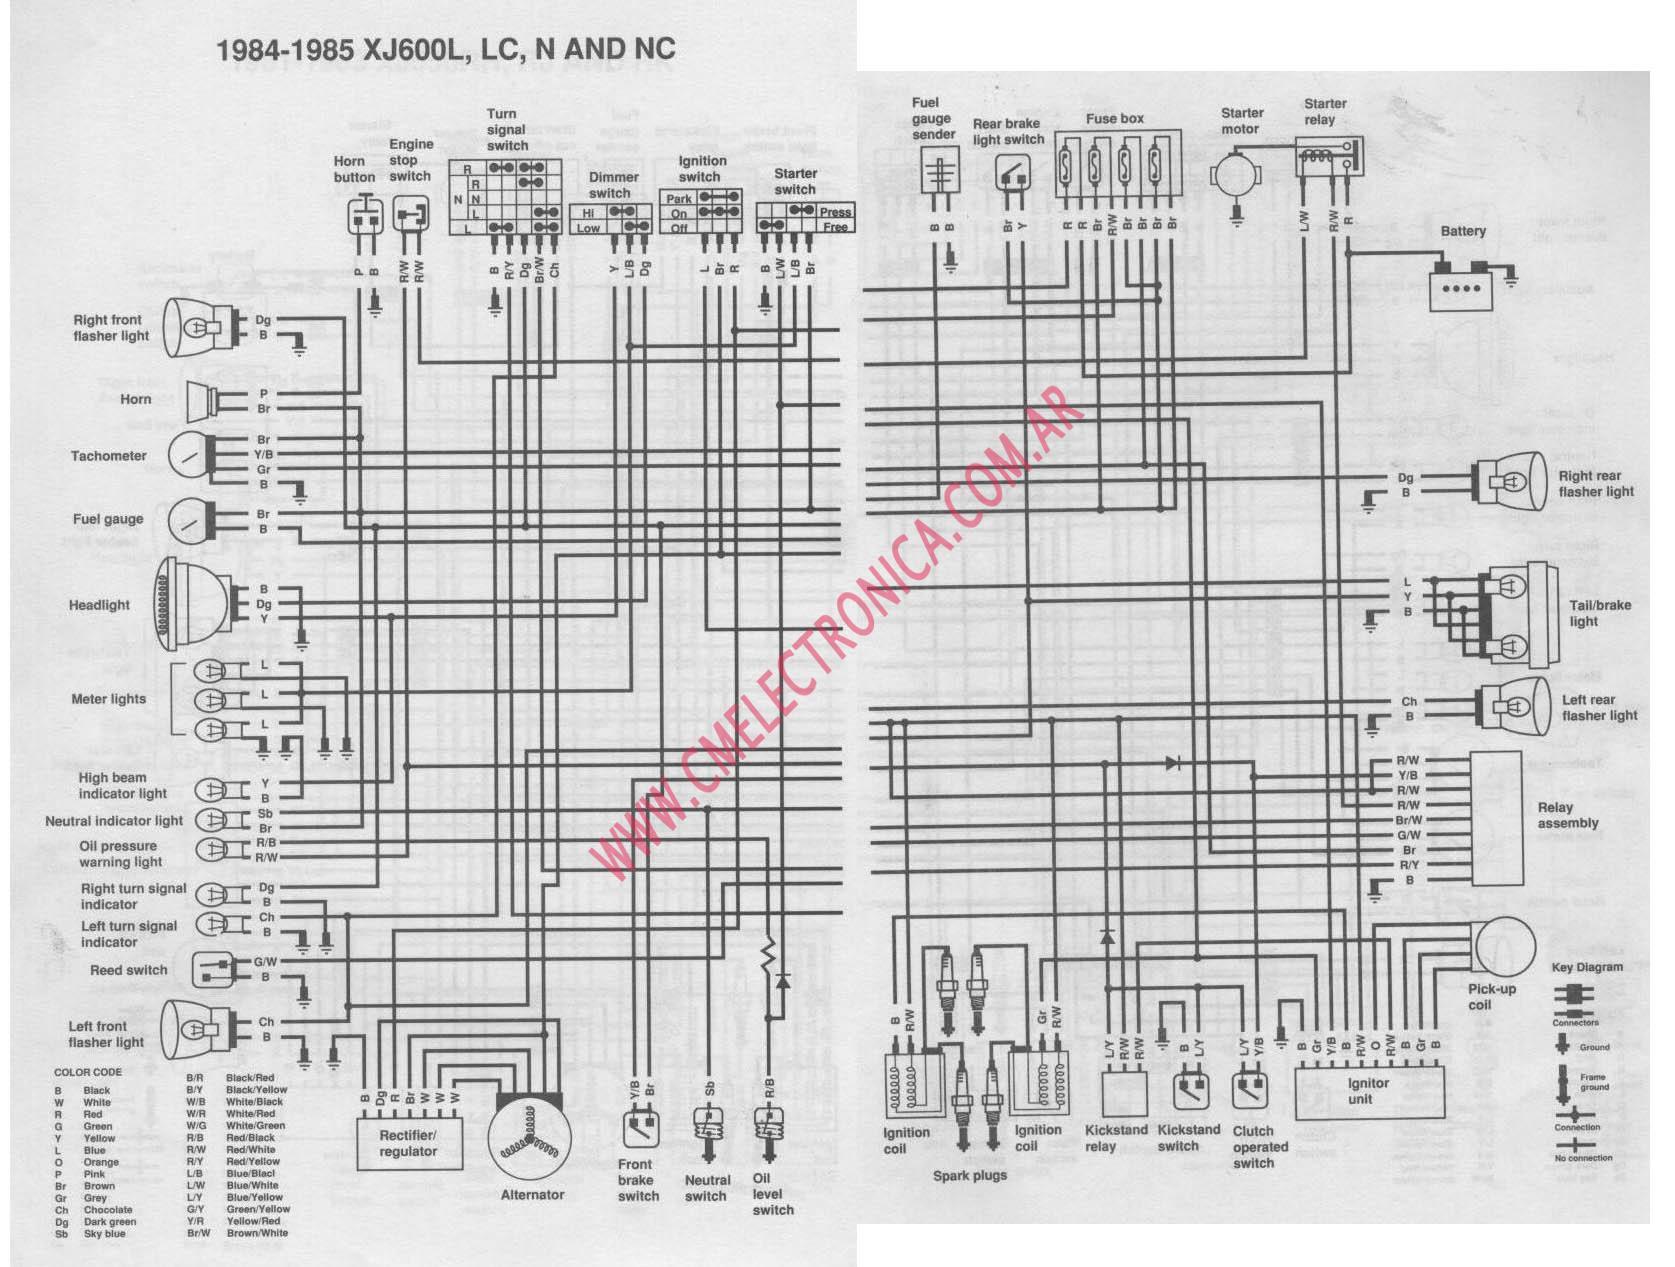 xj 600 wiring diagram wiring diagram rh eu67 cdu grossefehn de yamaha xj600 pre diversion wiring diagram yamaha xj600 51j wiring diagram